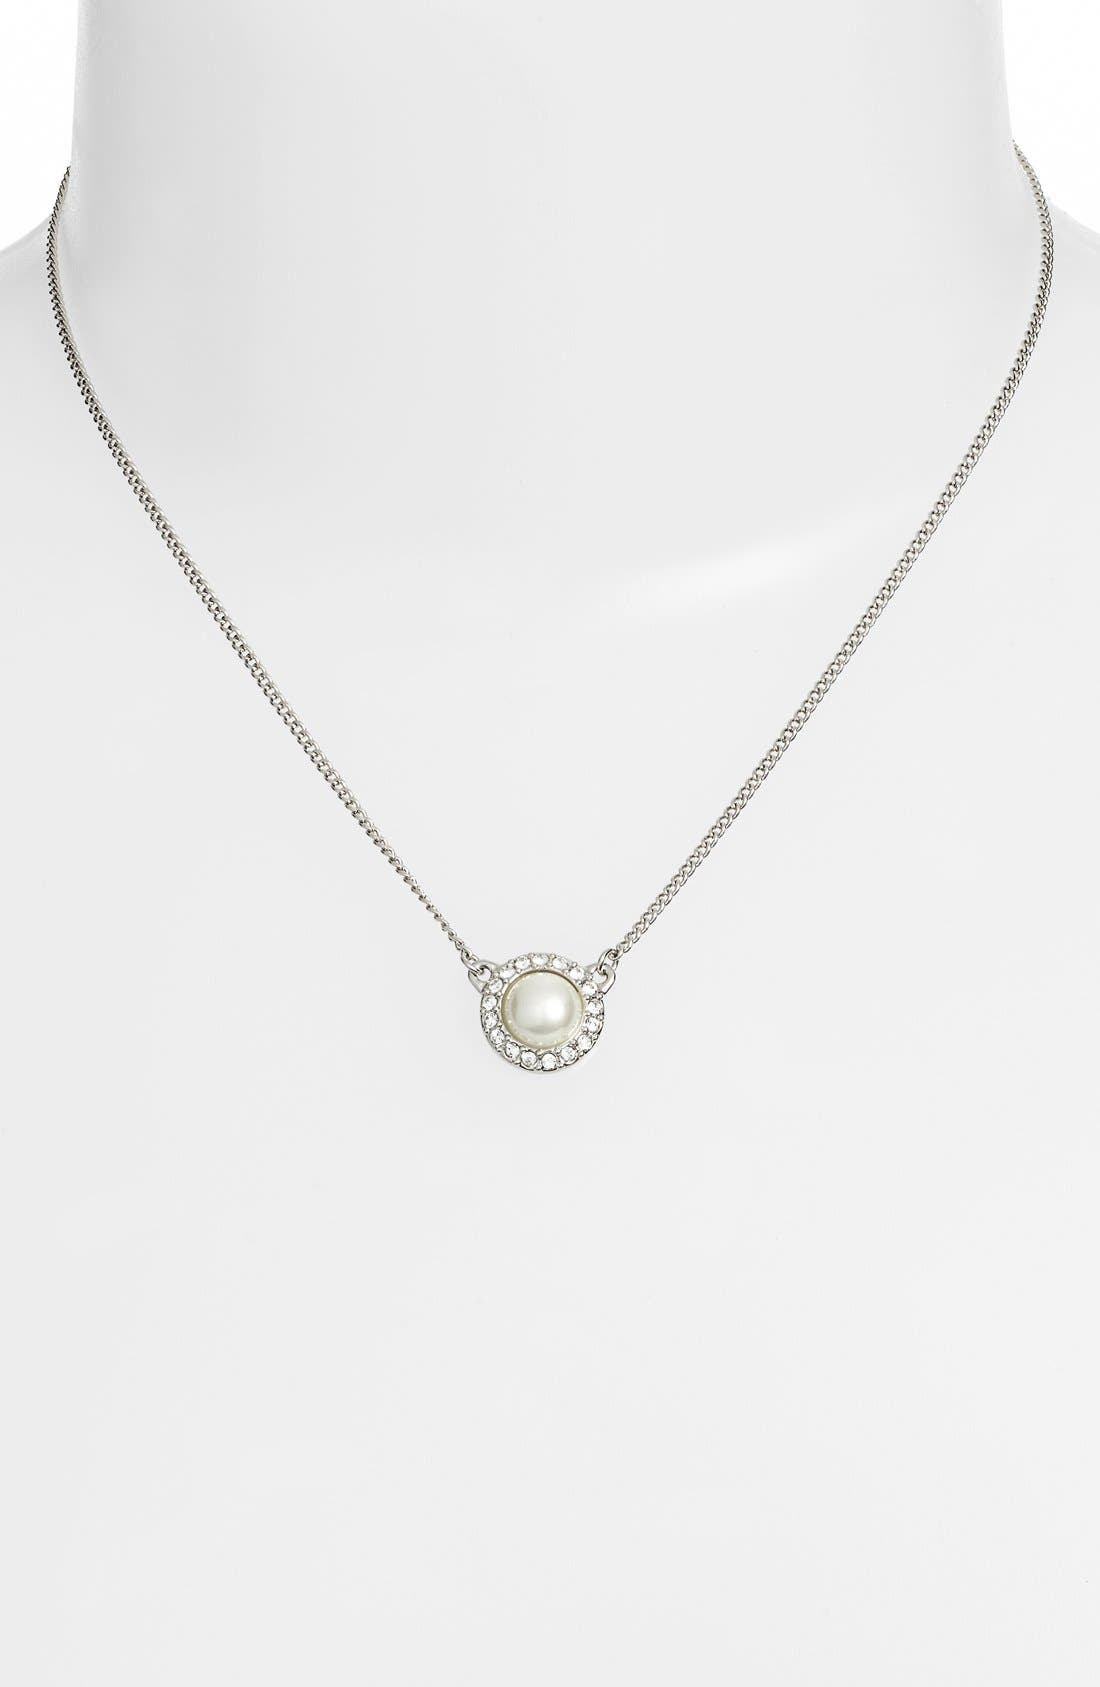 Imitation Pearl Pendant Necklace,                             Alternate thumbnail 2, color,                             Silver/ White